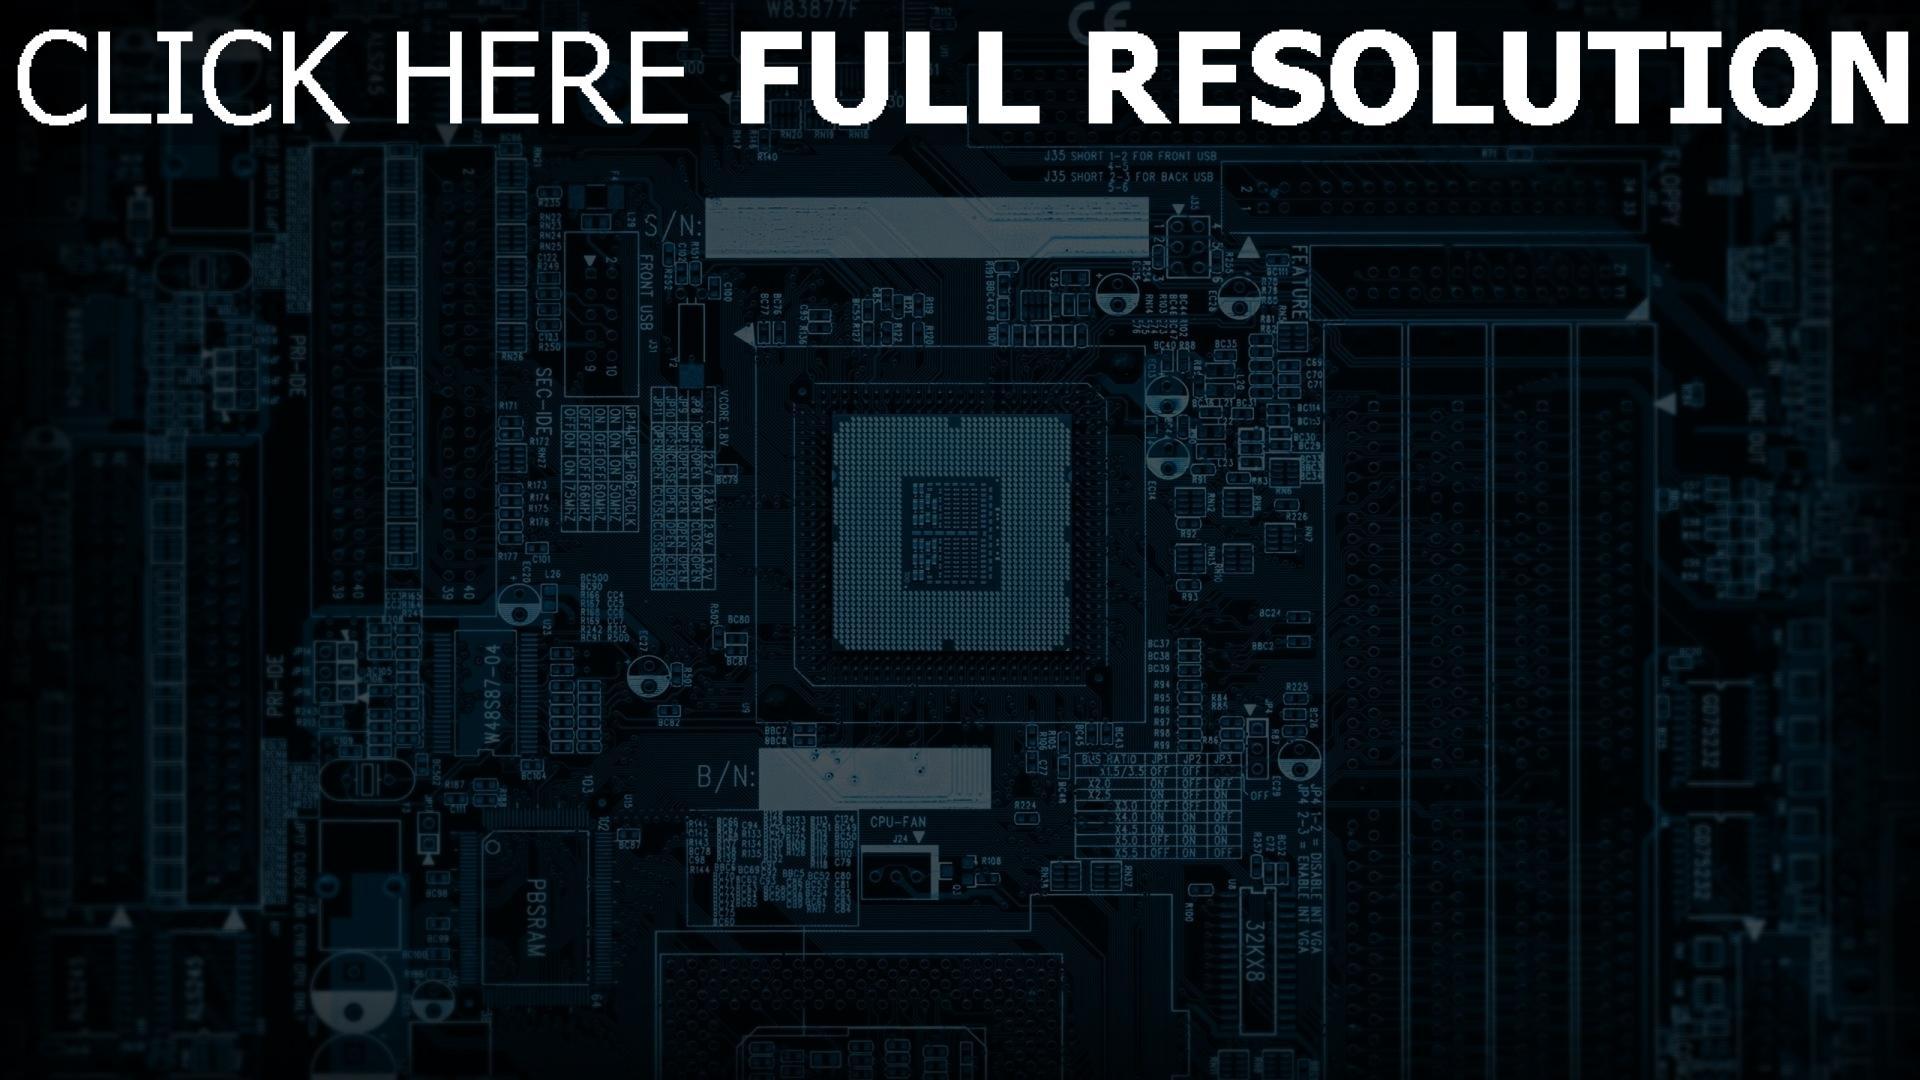 fond d'écran 1920x1080 microcircuit bleu gros plan